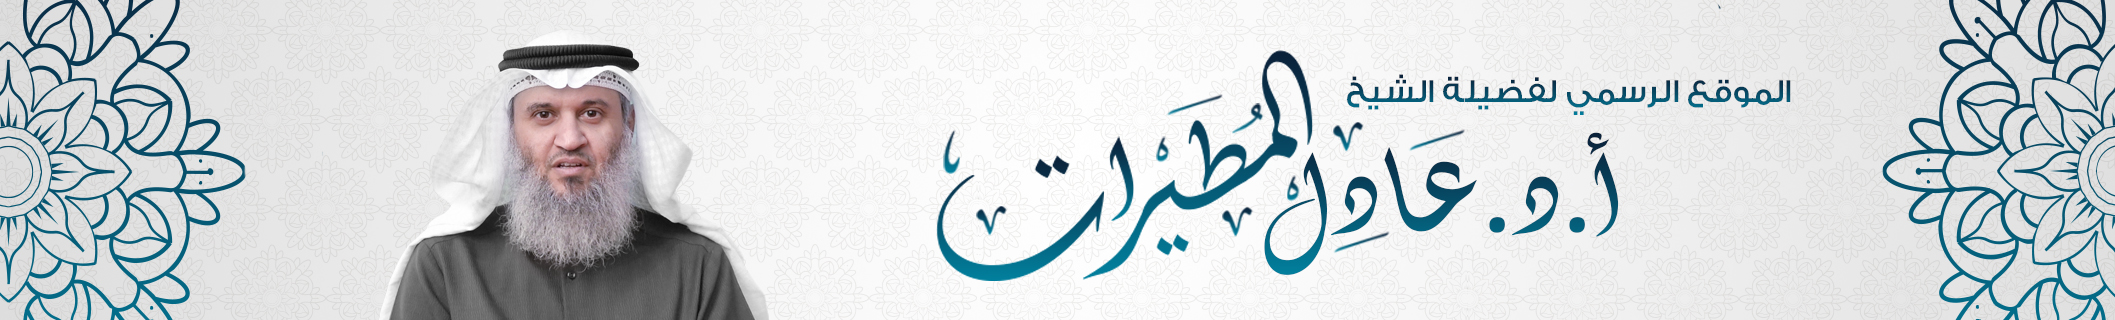 أ.د. عادل المطيرات